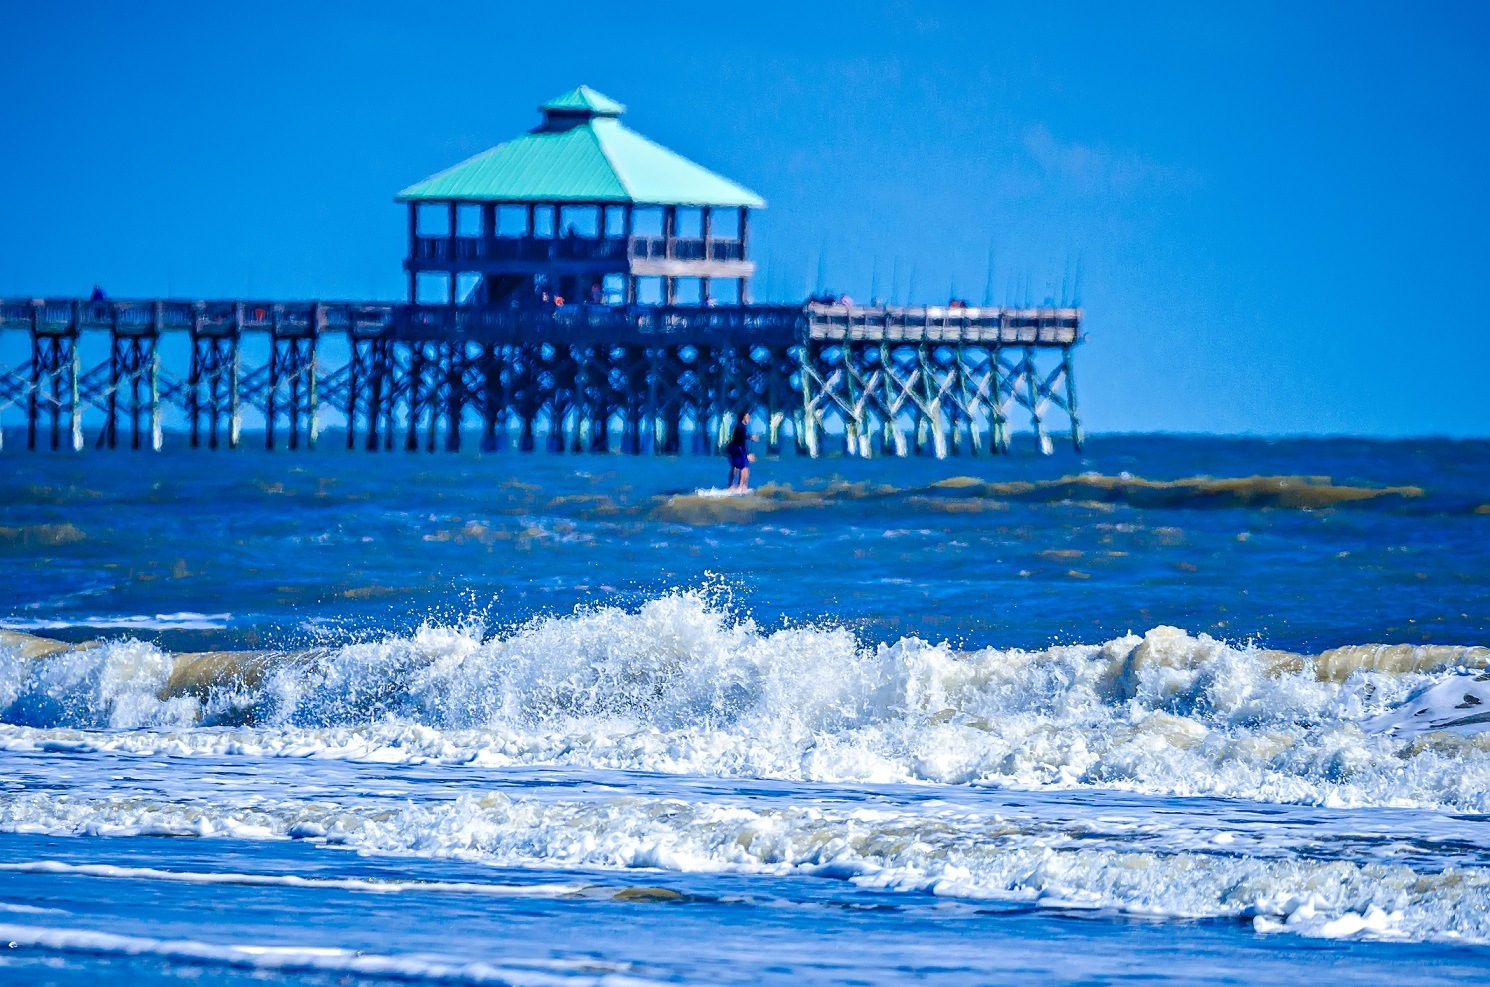 Folley Beach, South Carolina